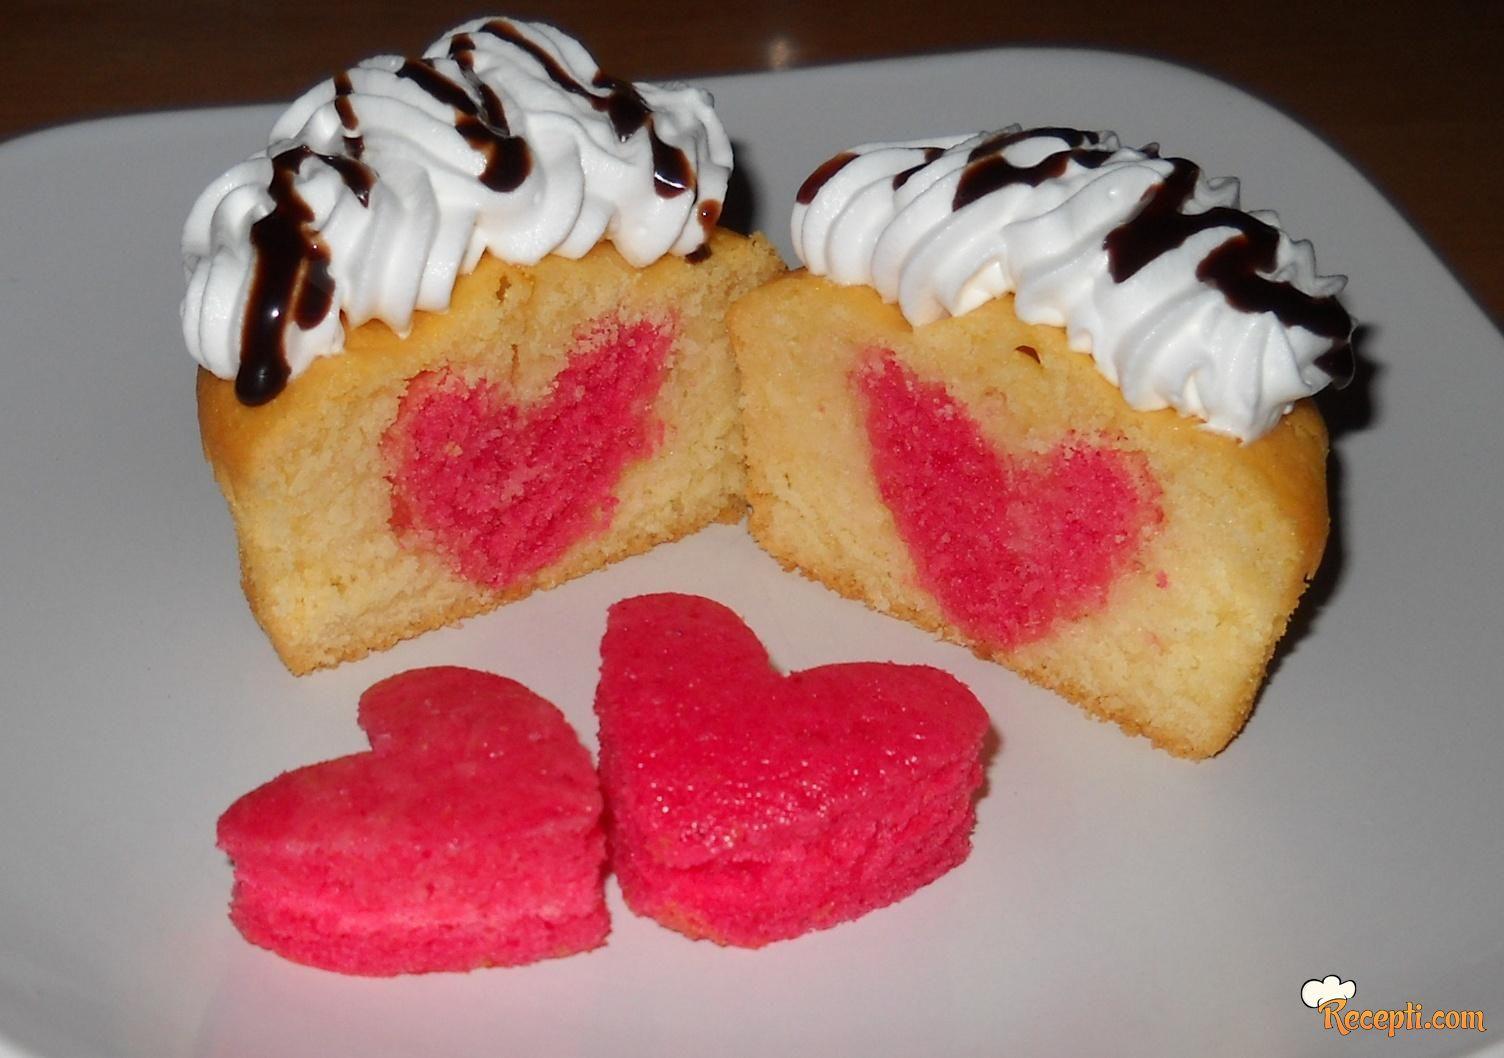 Muffini sa srcem (Muffins Valentine's day)